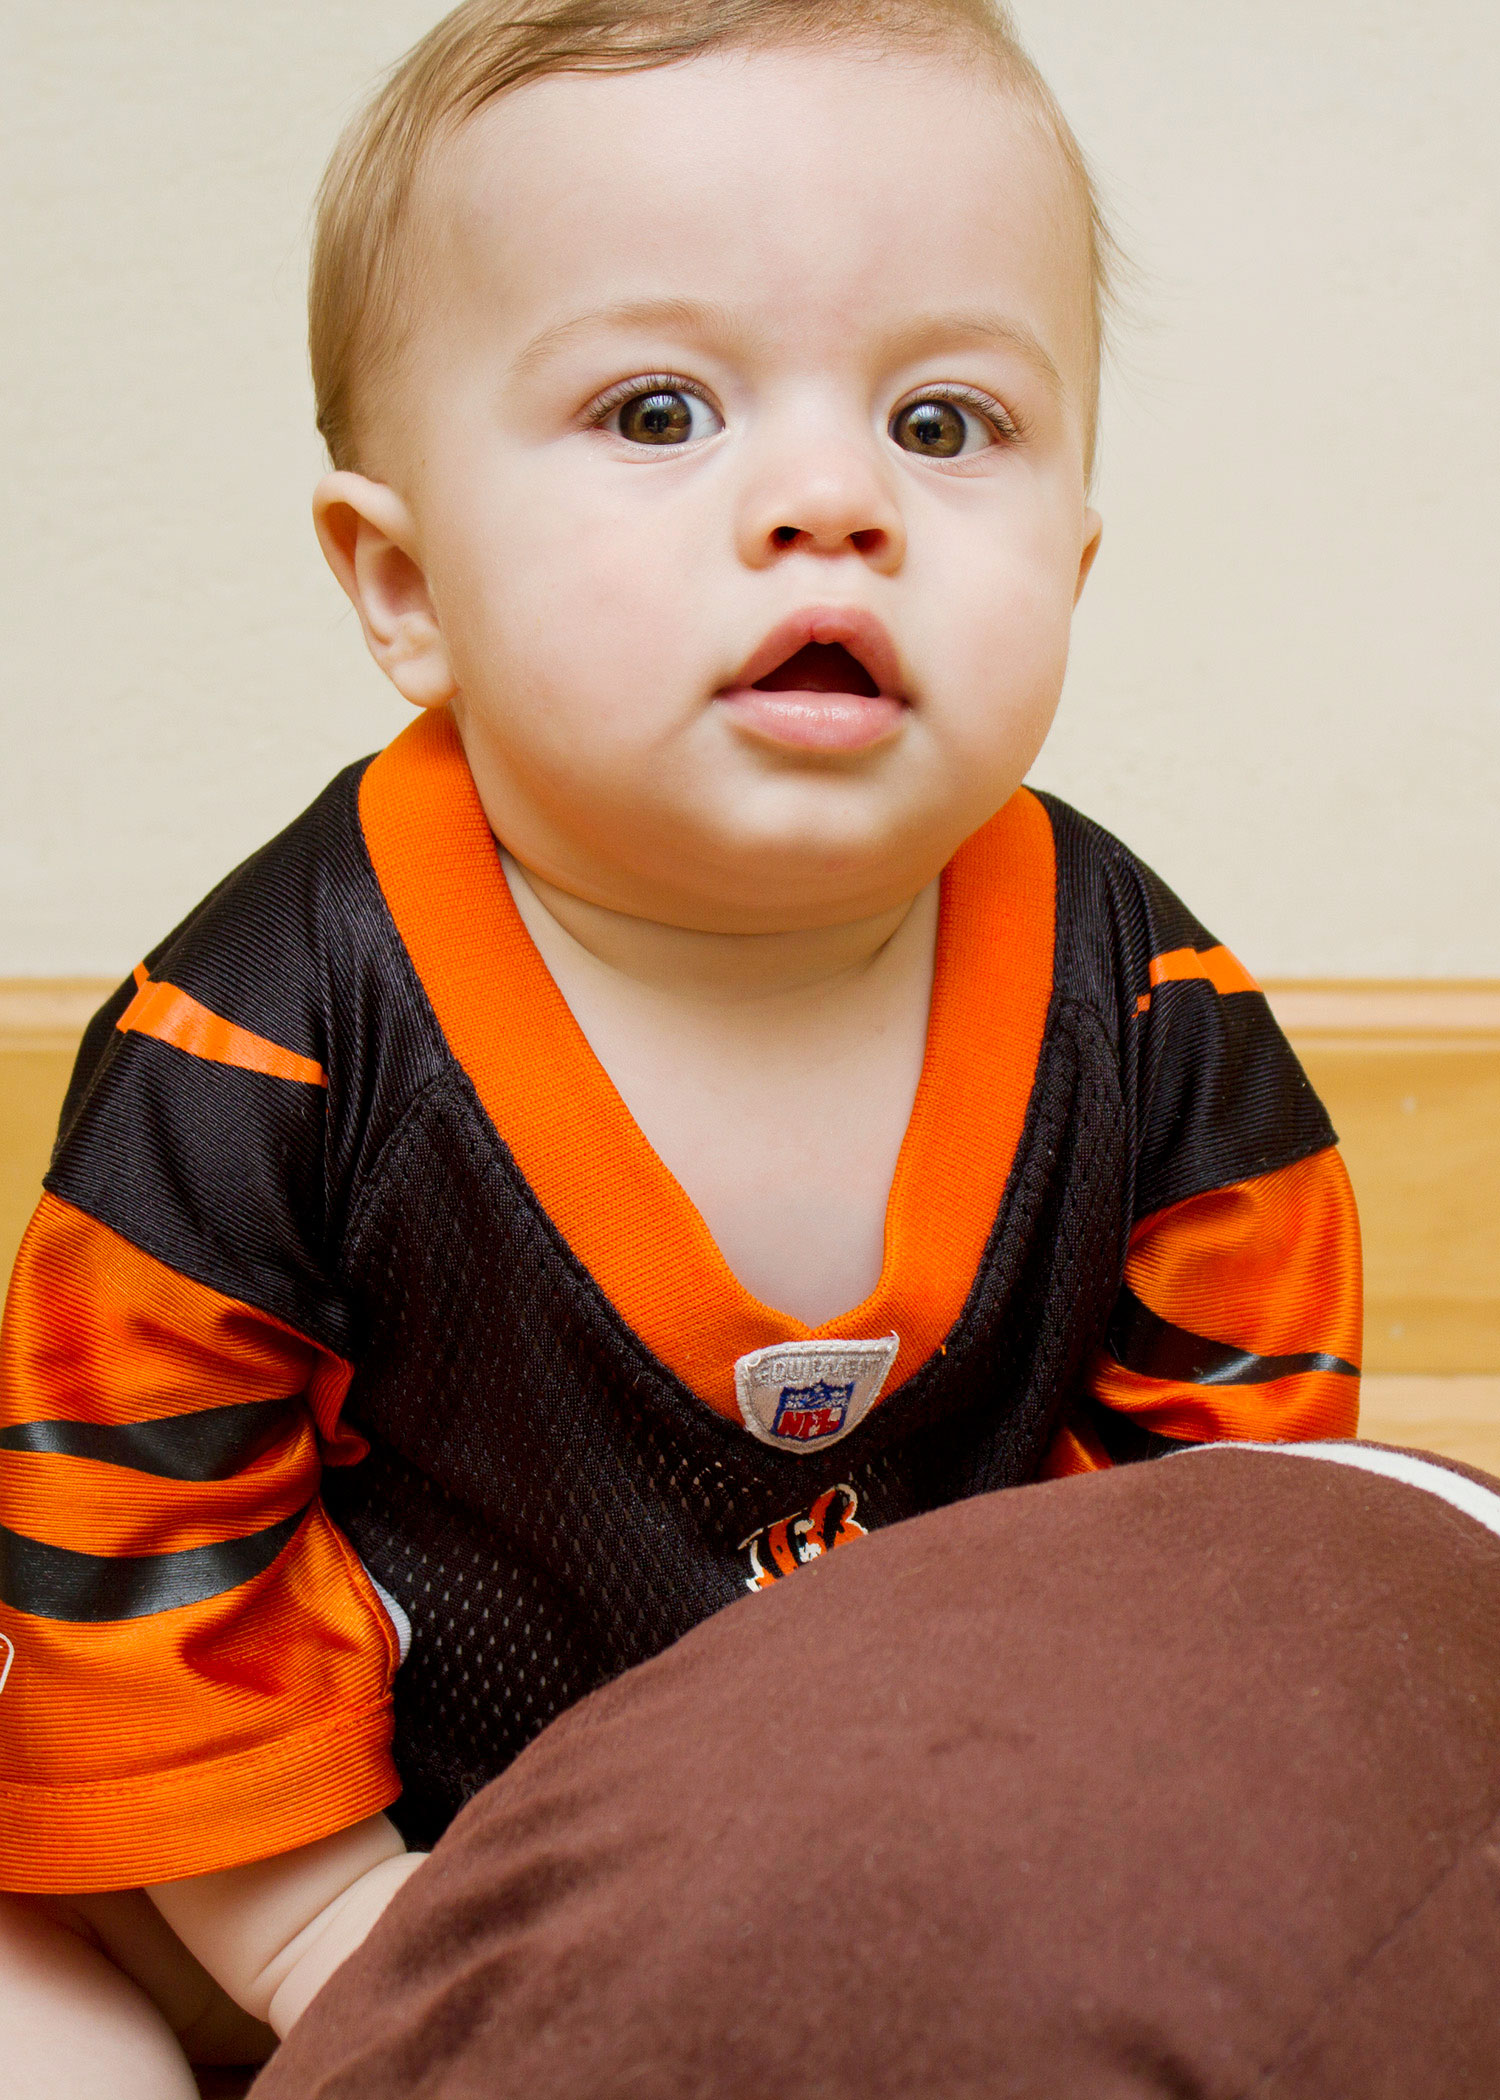 Baby Football Portrait